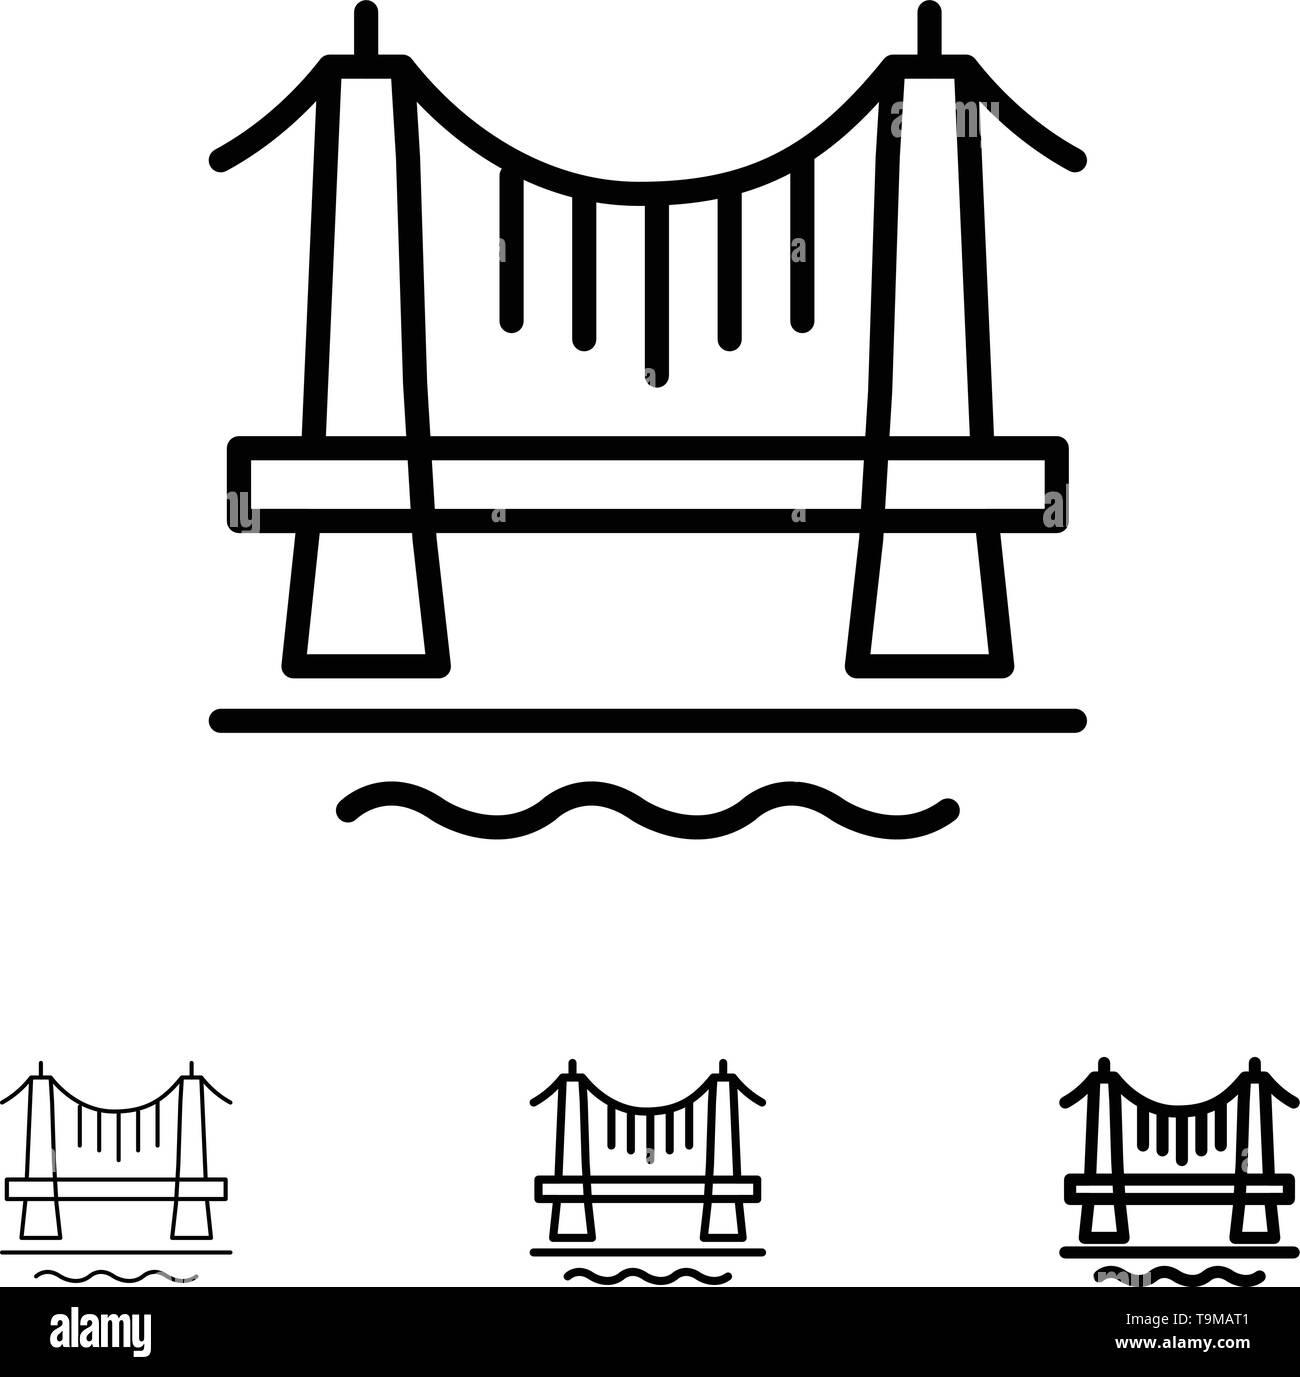 Bridge, Building, City, Cityscape Bold and thin black line icon set - Stock Image